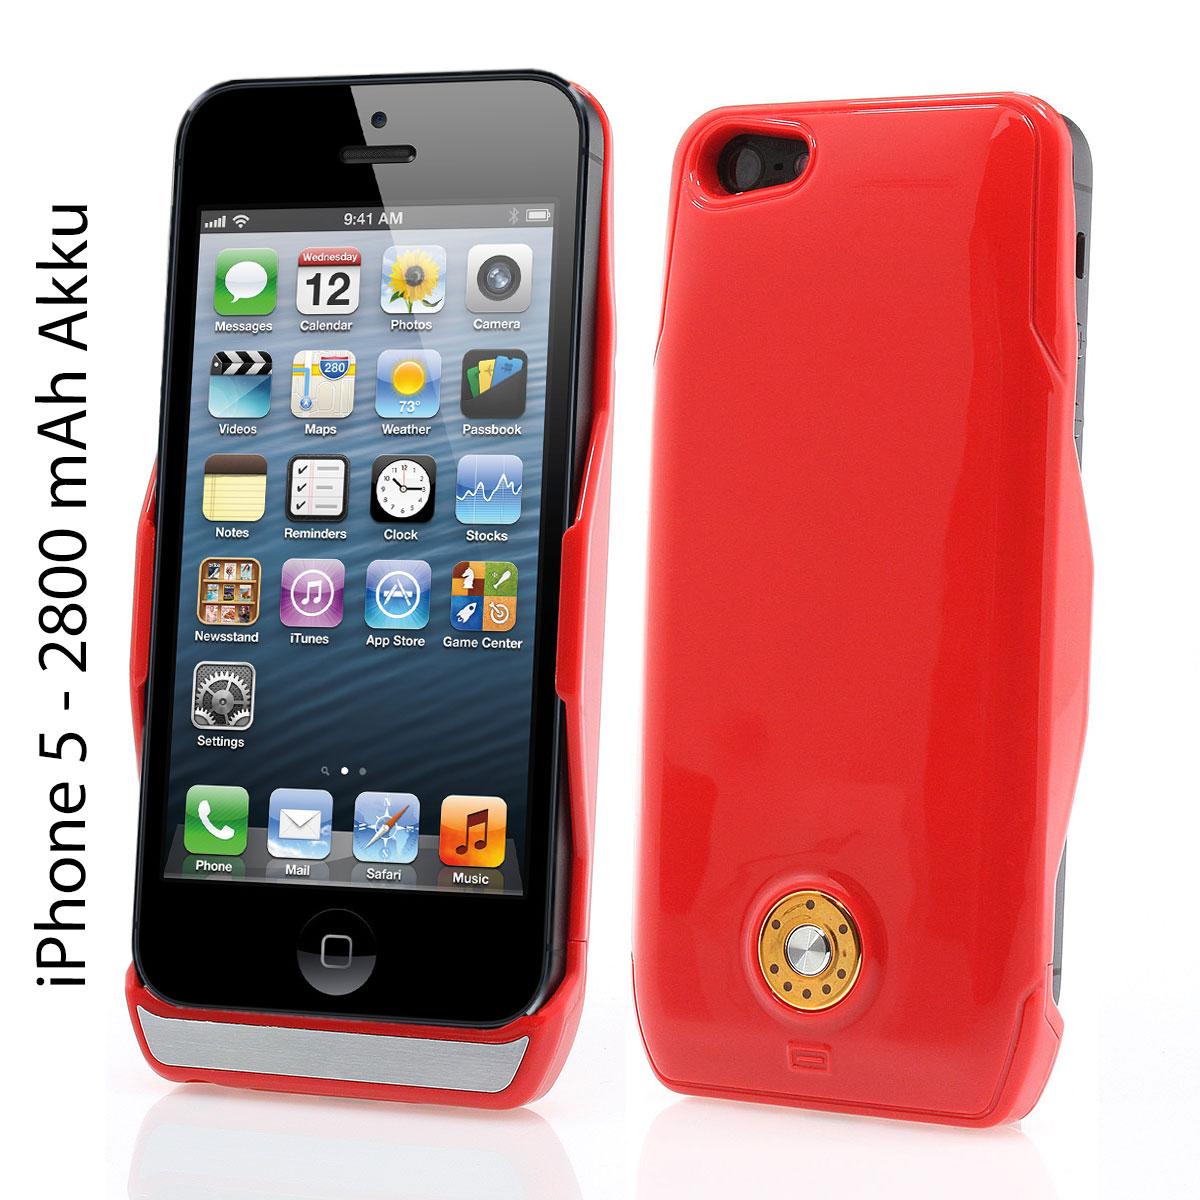 Apple-iPhone-5-Zusatzakku-2800-mAh-Power-Akku-Pack-Huelle-Cover-Case-rot